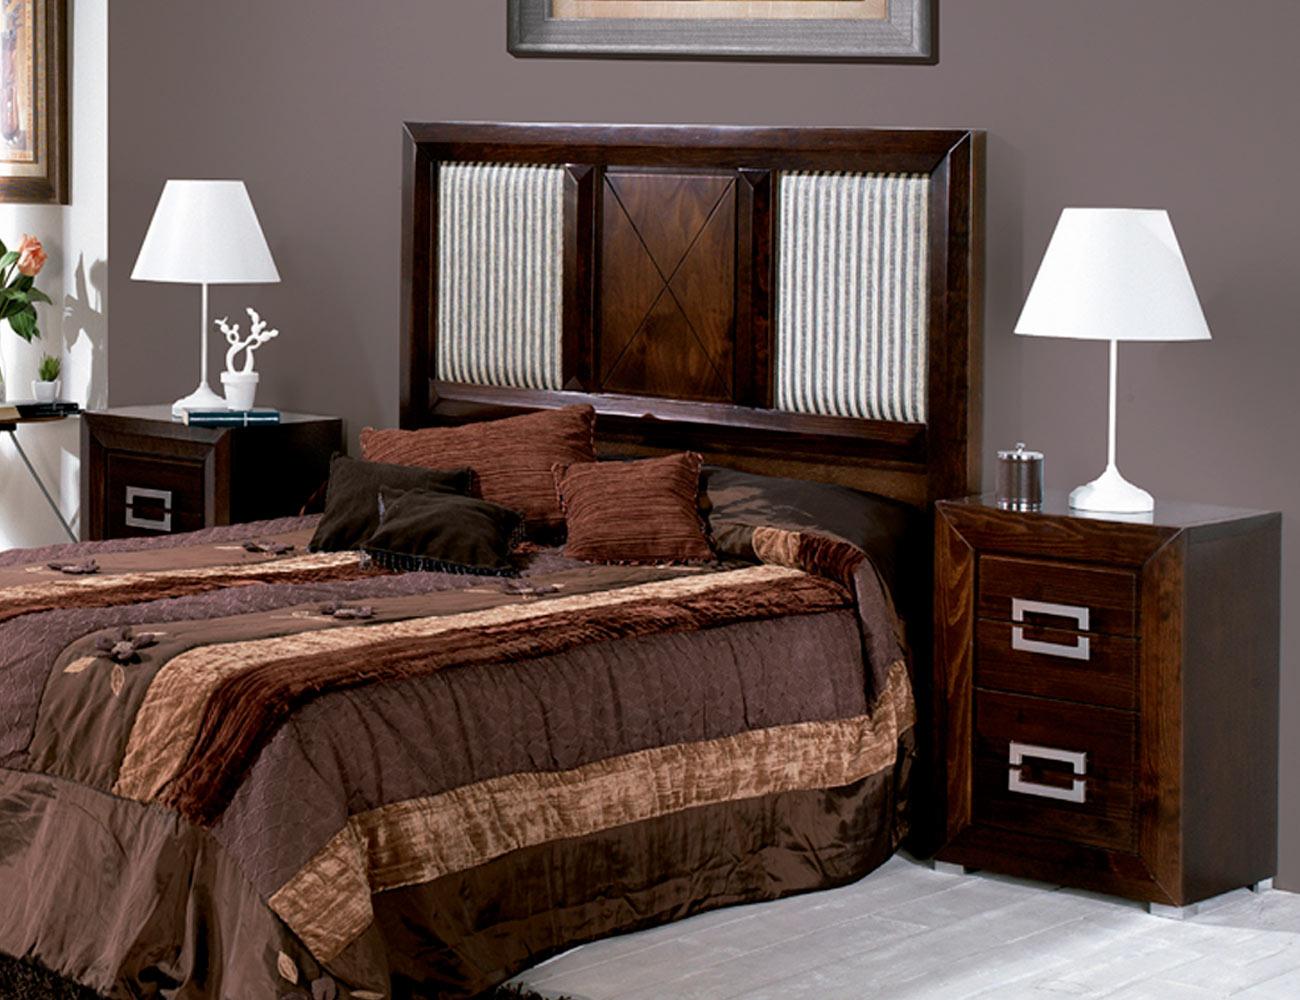 Composicion25 dormitorio matrimonio detalle